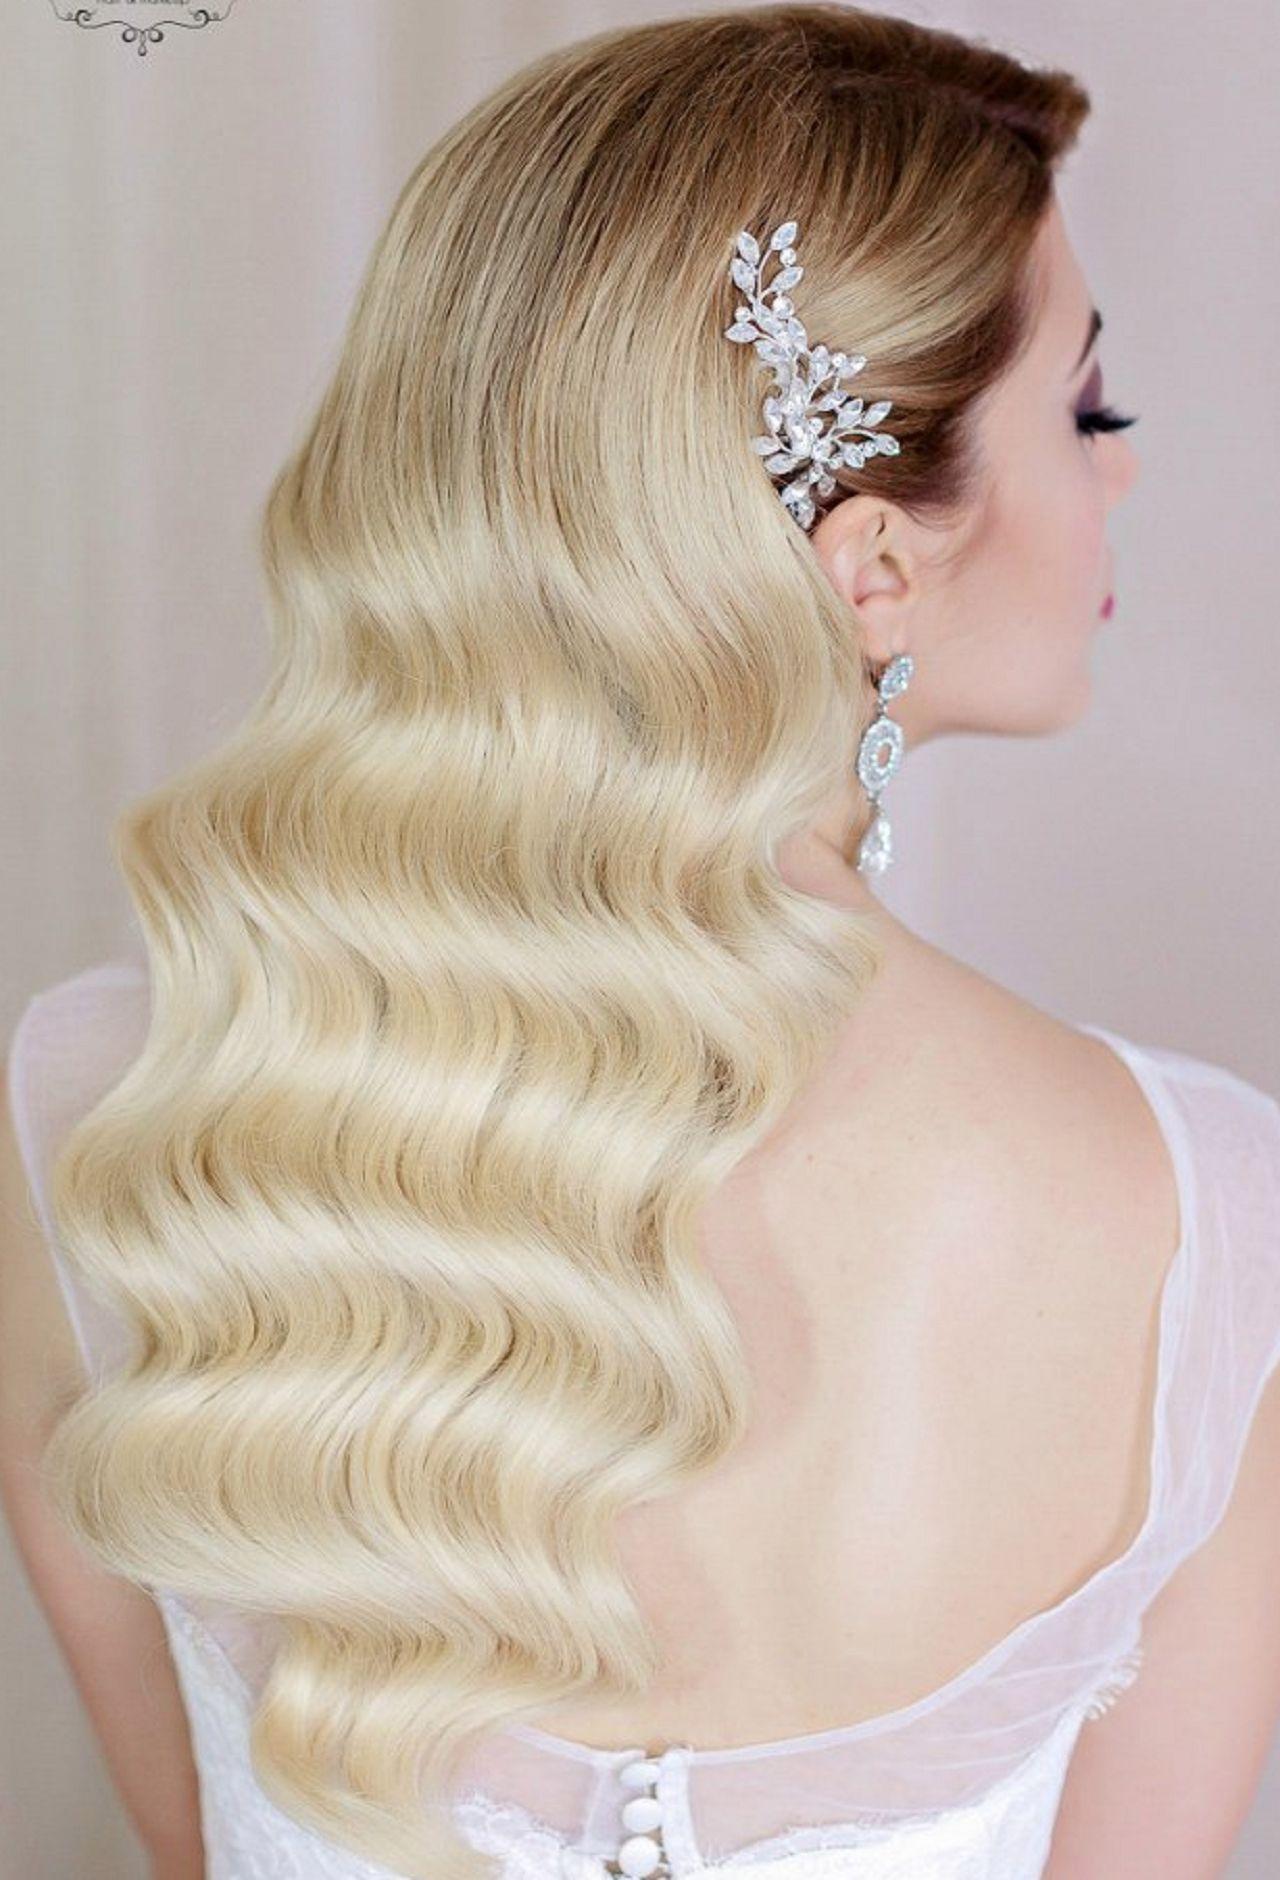 100+ Hairstyles Wedding hairstyle   Hair Styles   Pinterest   Hair ...